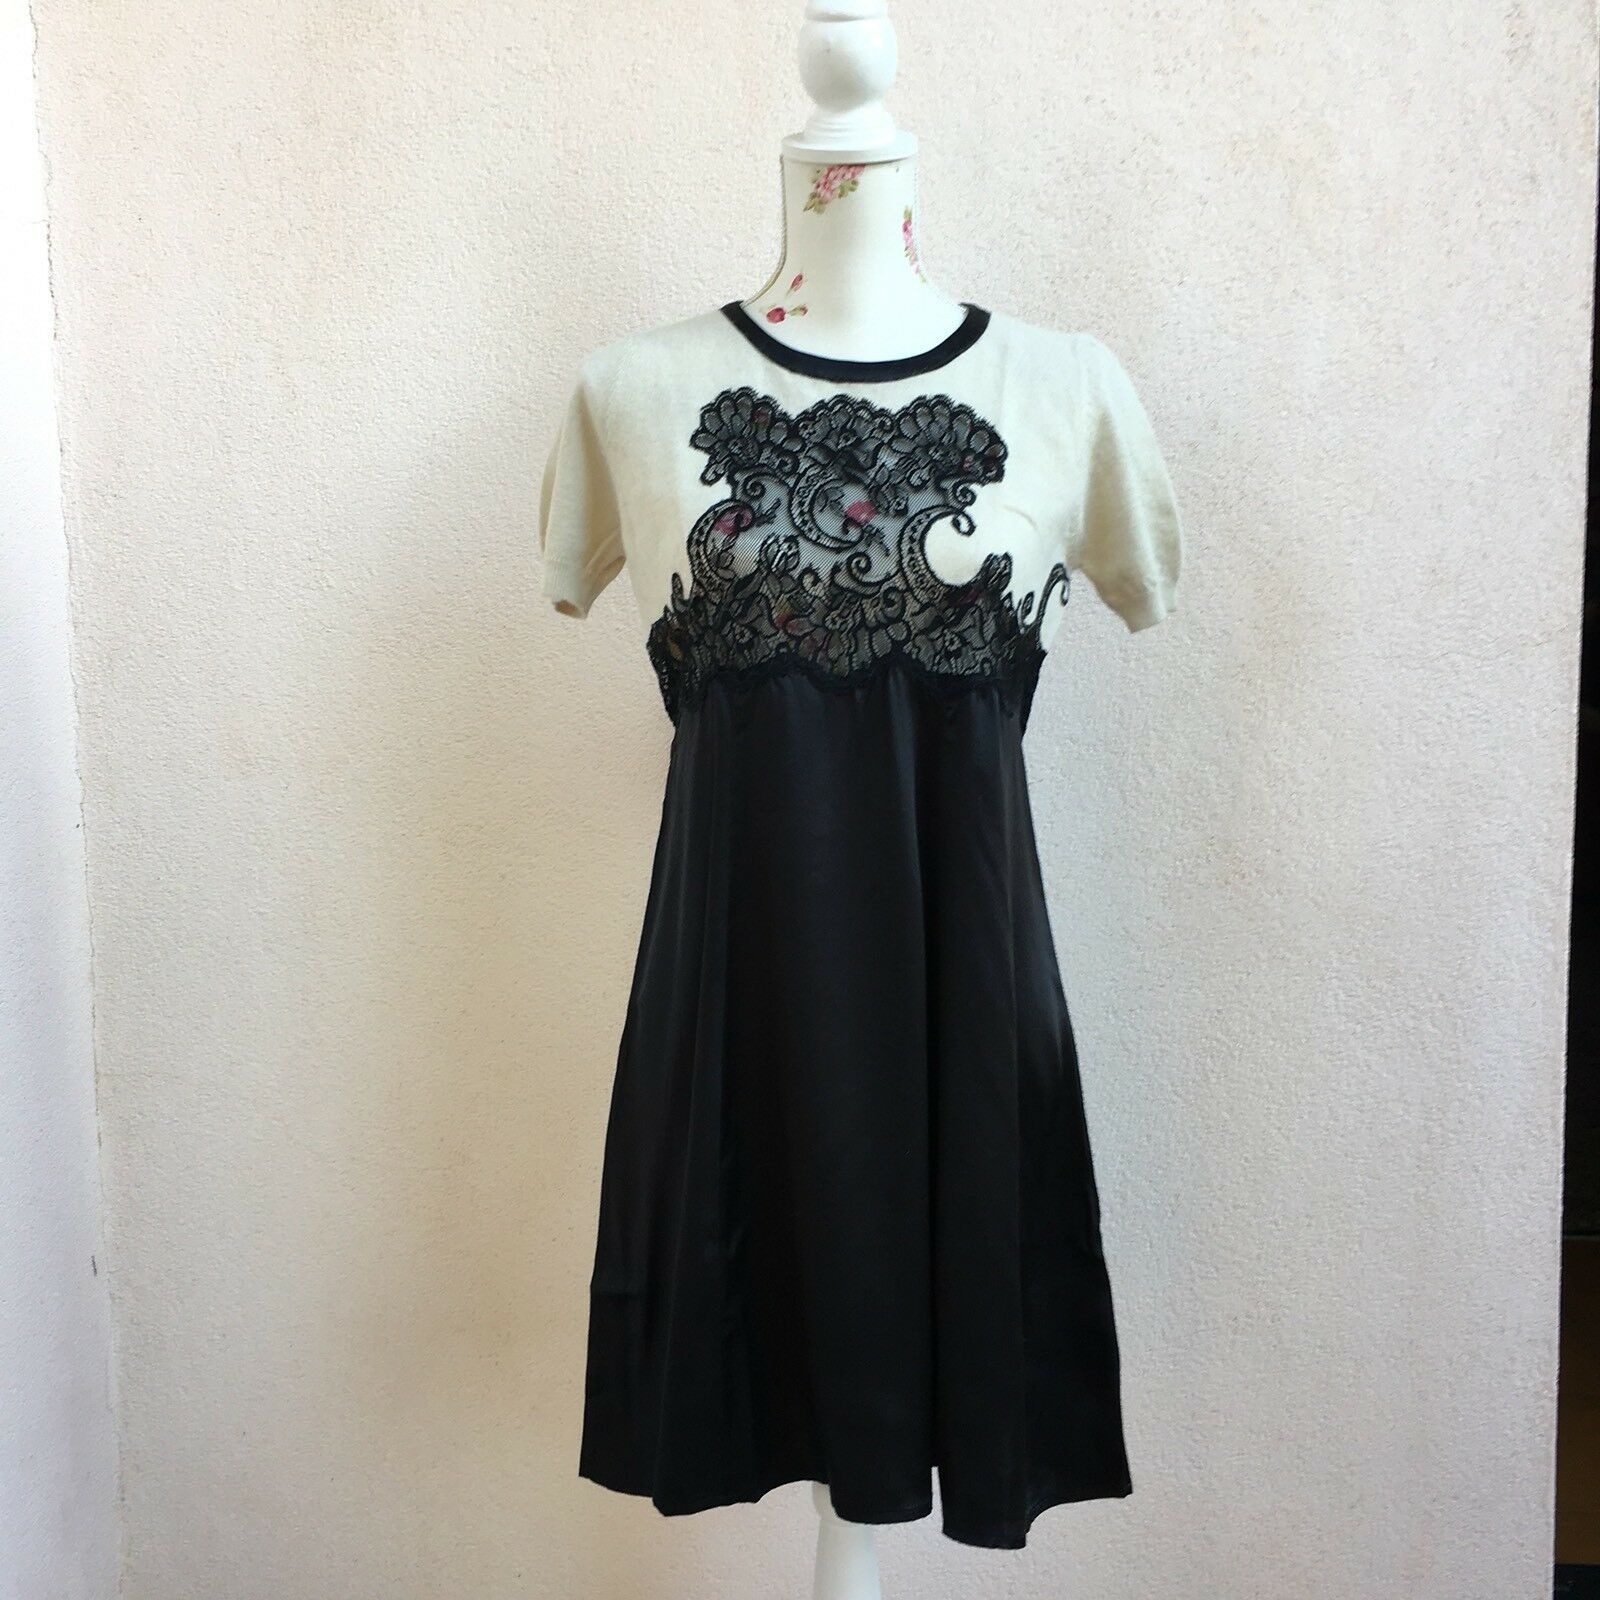 TWIN SET by Simona Barbieri abito vestito pizzo seta lana noir panna Robe Tg M